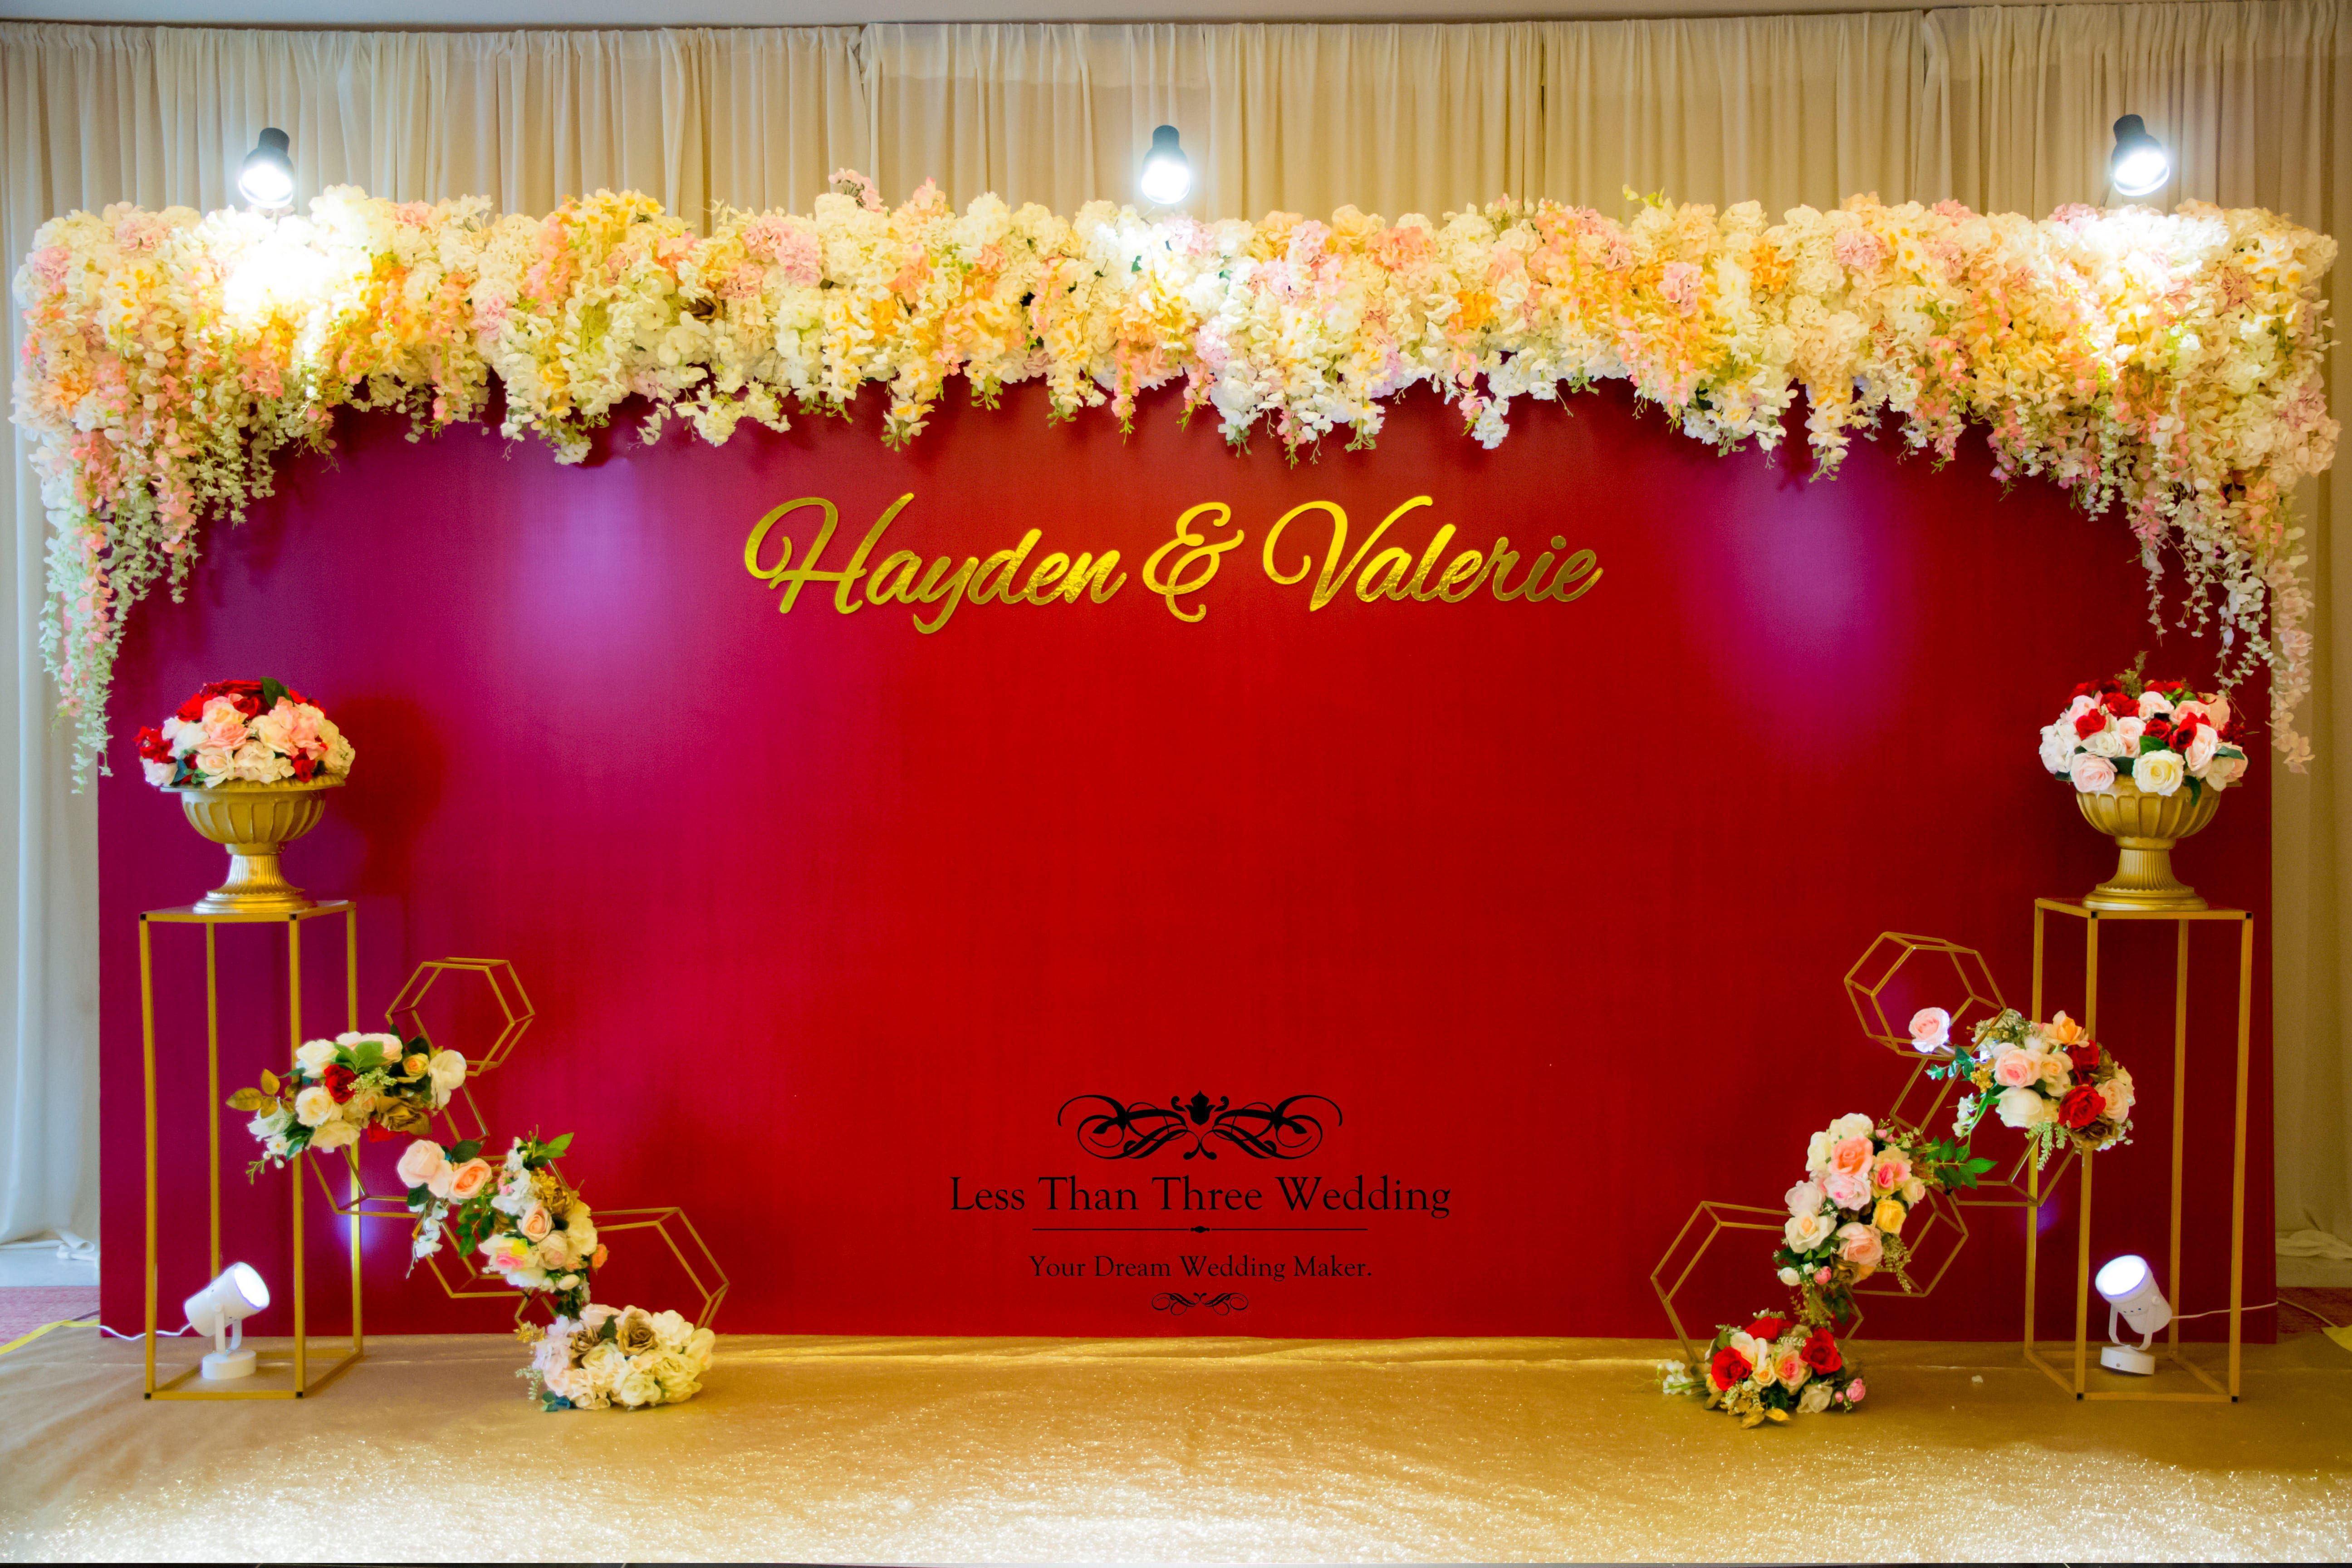 Less Than Three Wedding Photobooth Lessthanthreewedding Photobooth Red Gold Simple Elegant Backdrop Printingba Gold Backdrop Red Backdrop Wedding Deco